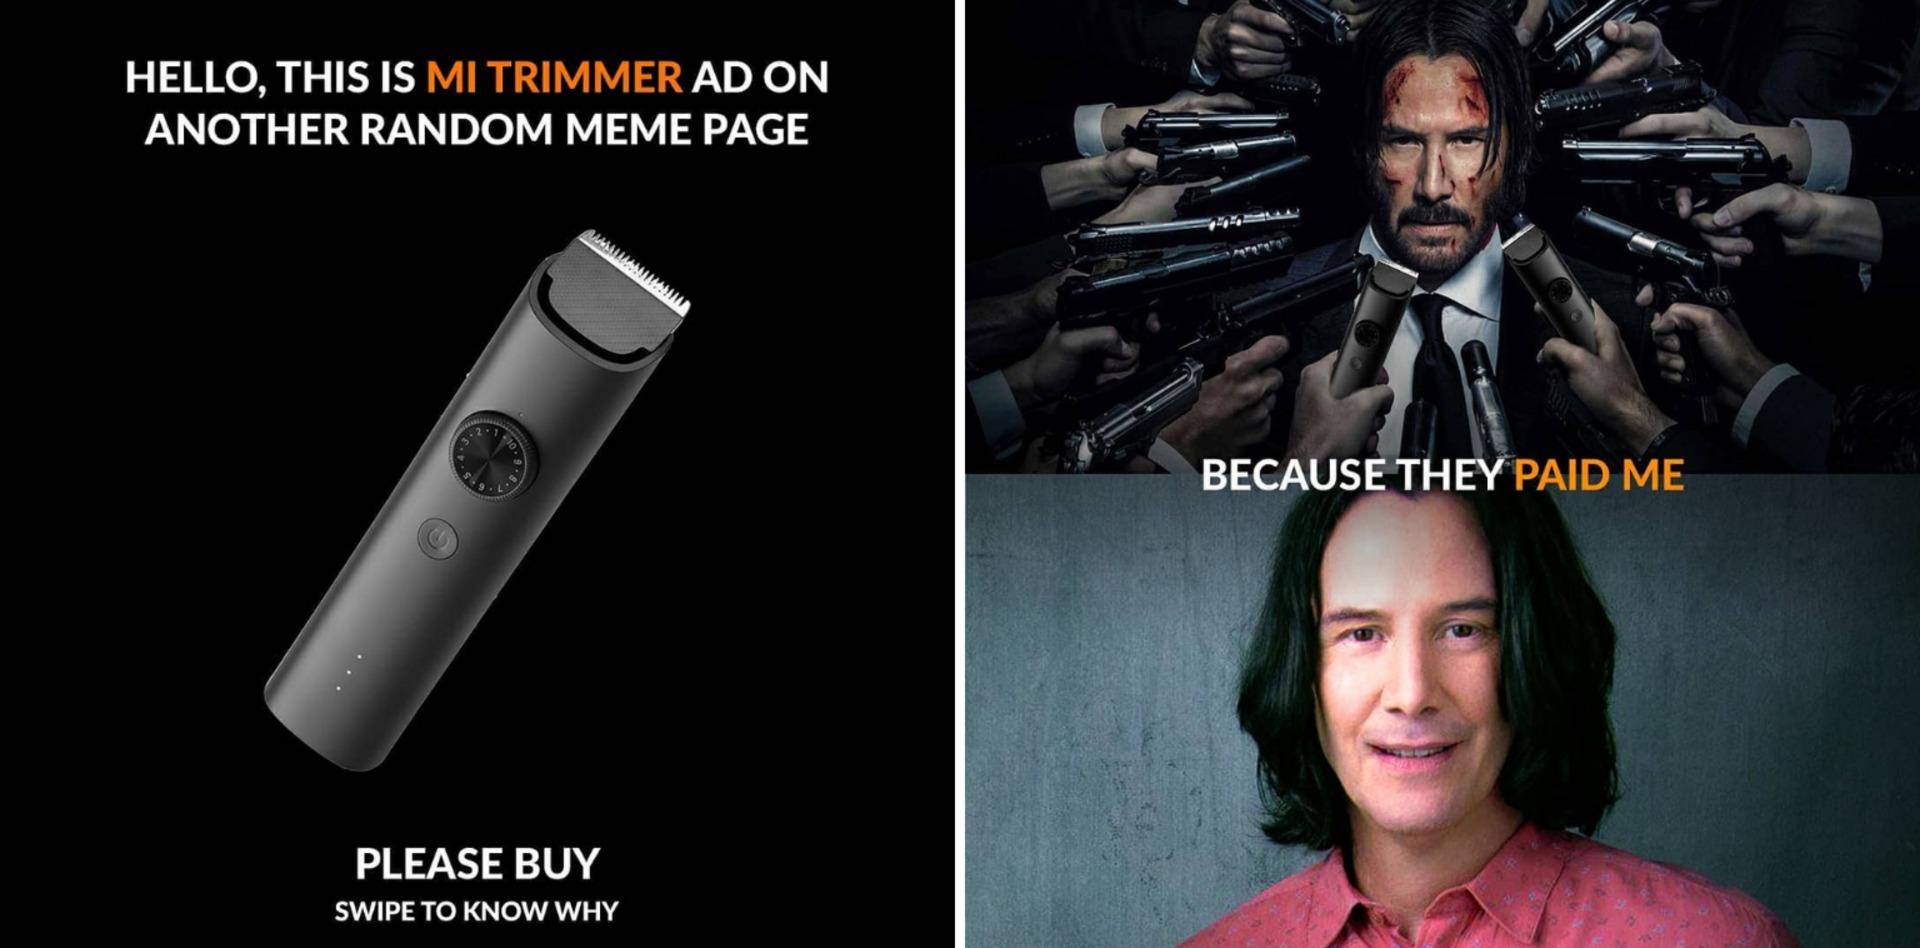 Winkl on Influencer Marketing - wldd